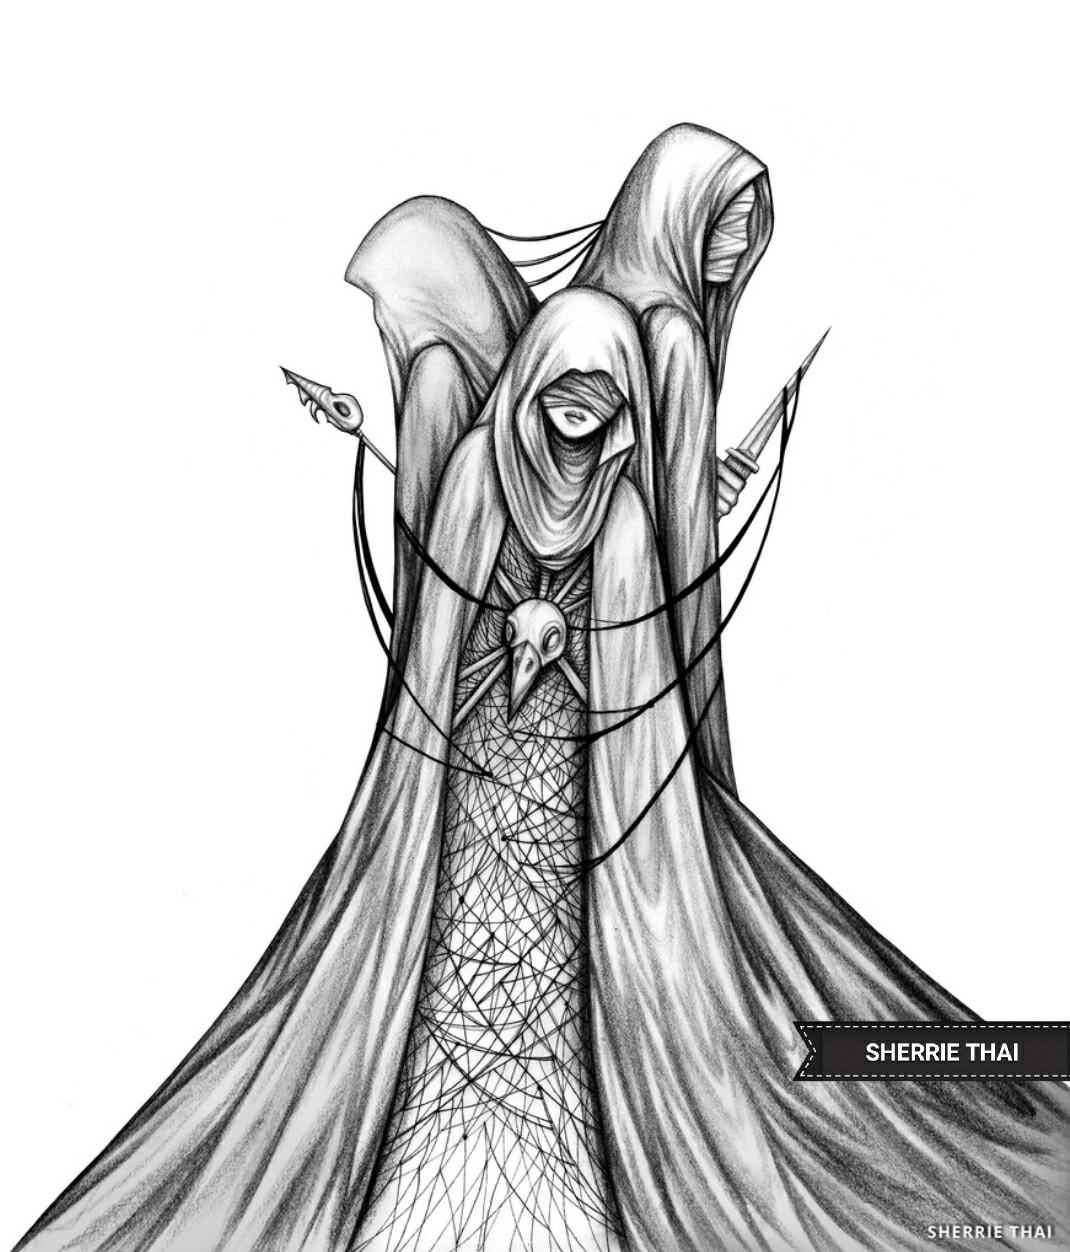 1070x1252 The Fates, Dark Fantasy Sketch Illustration Drawing. Black